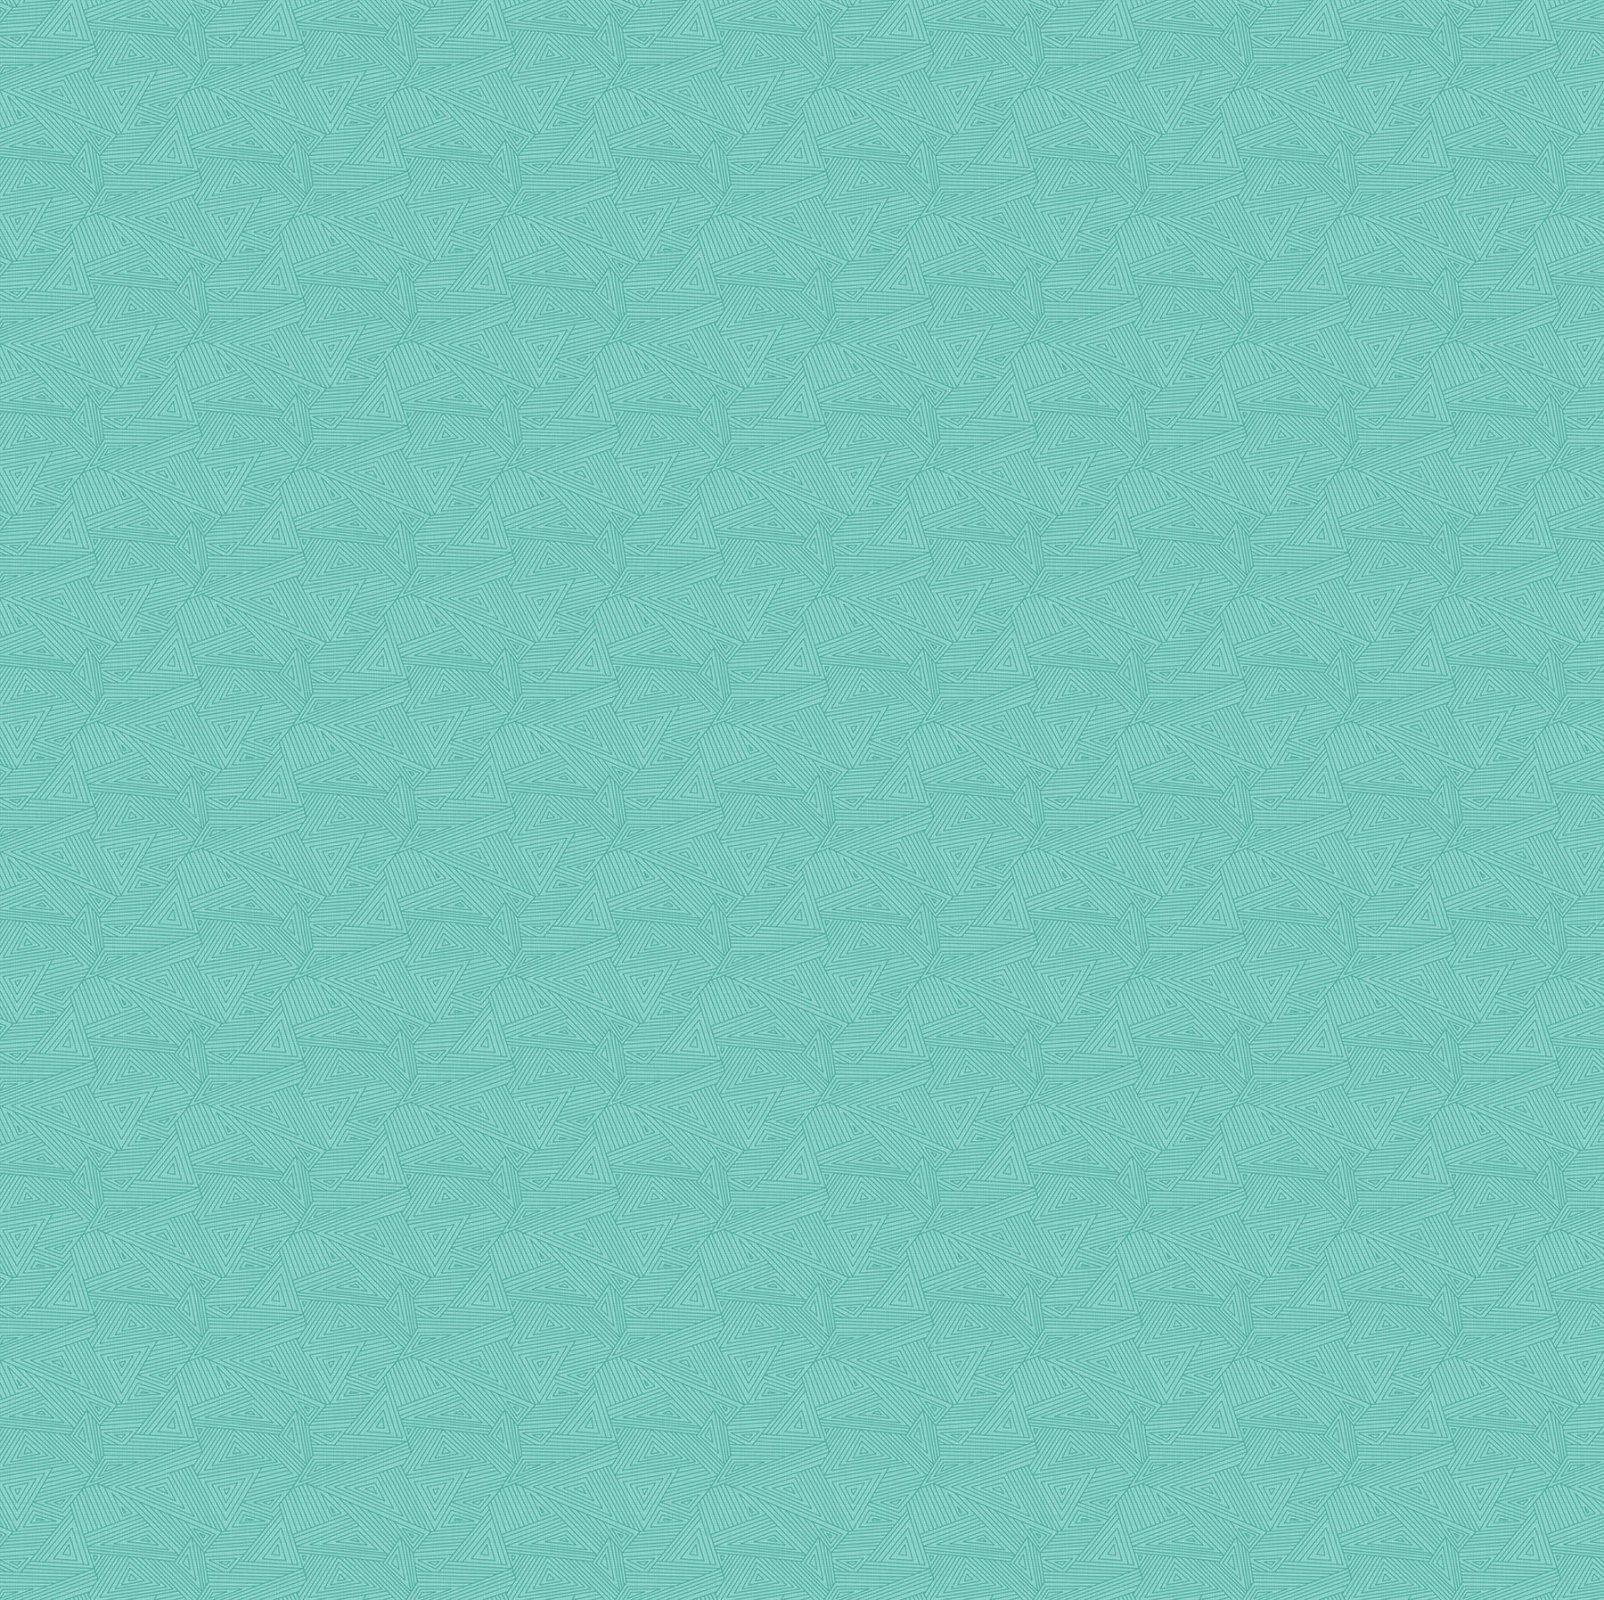 Cosmo Oxygen - All Over Blend Aqua